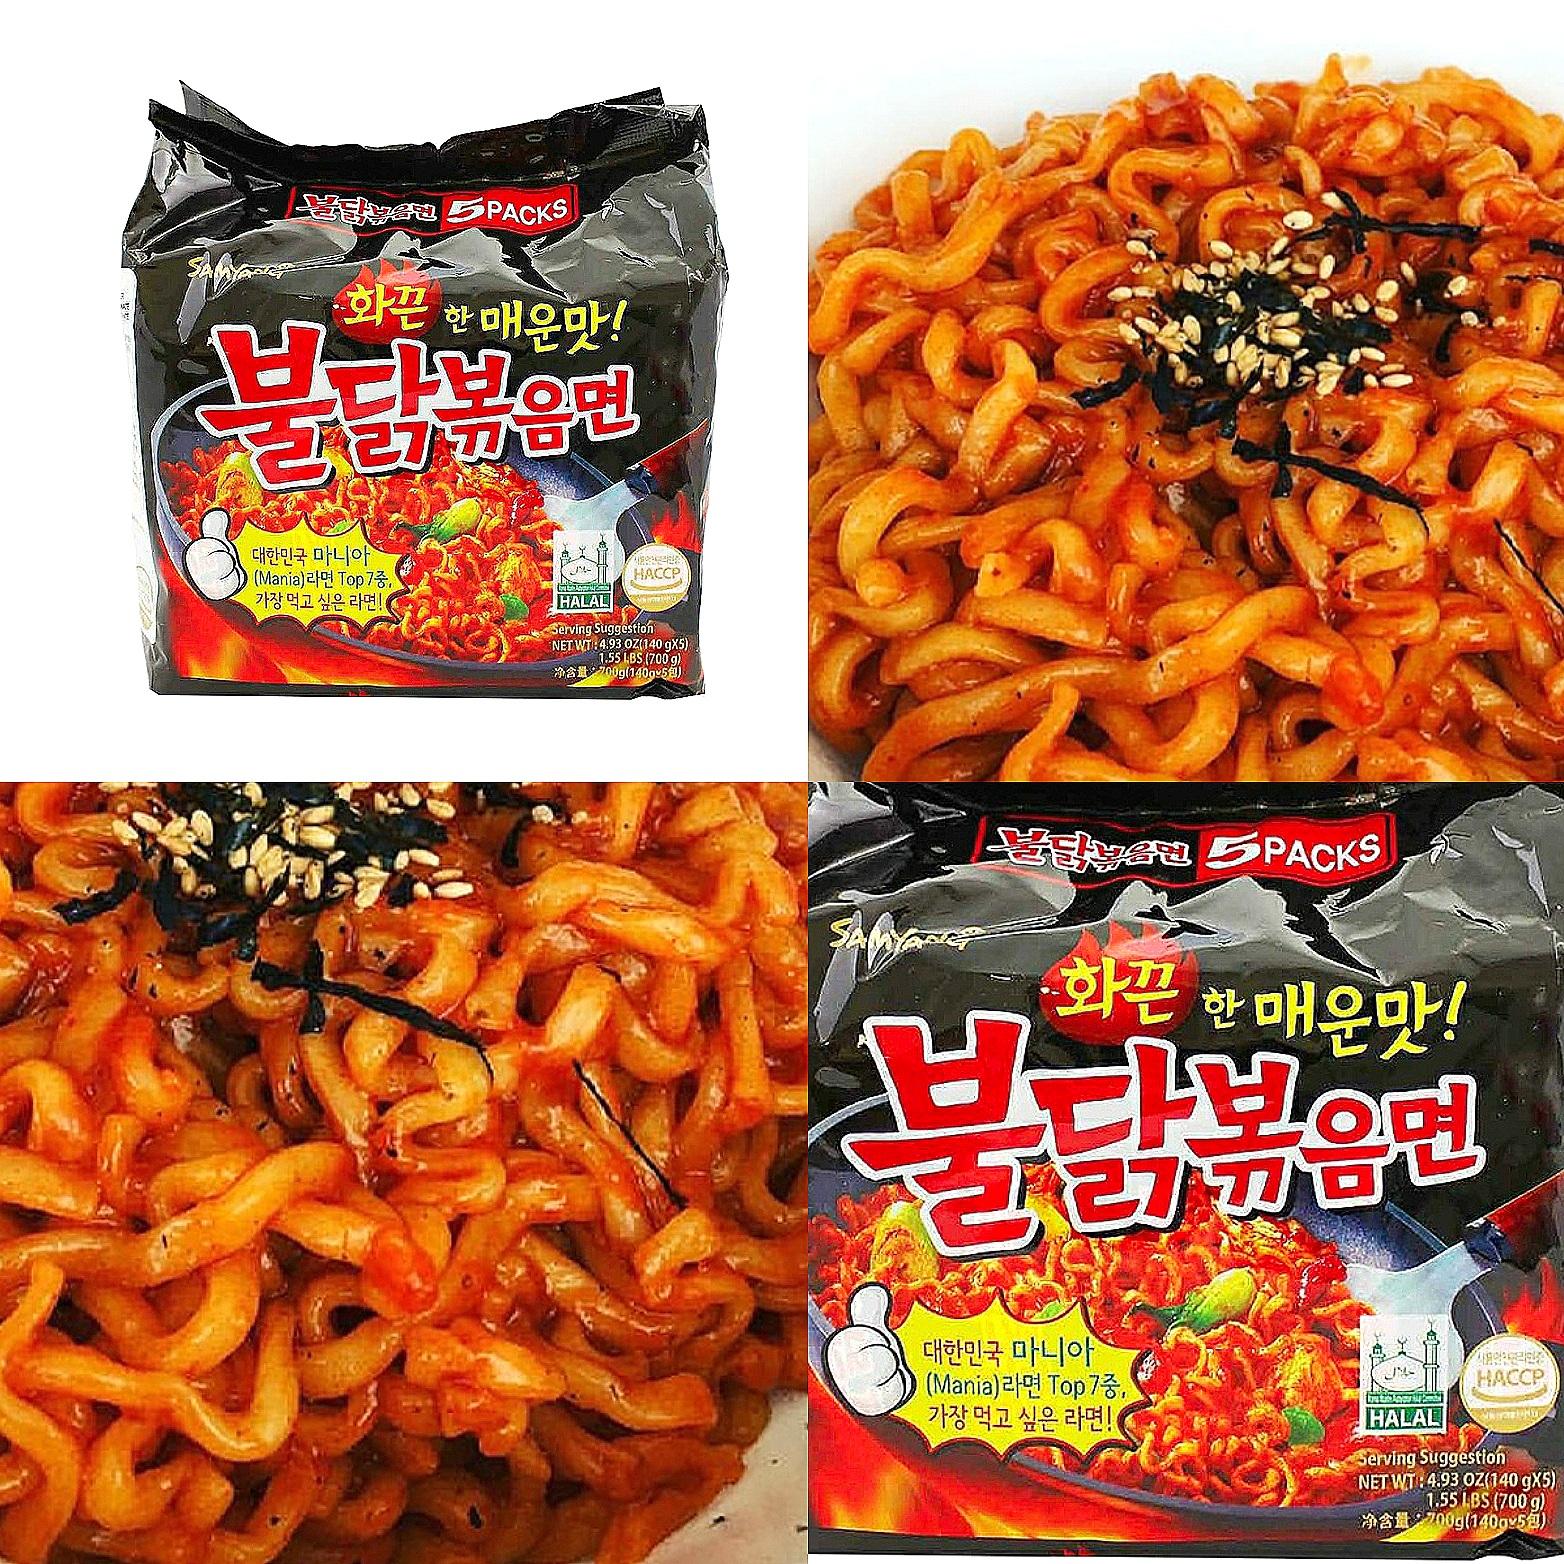 Jual Samyang Stew Soup Mie Instan 5 Pcs Terbaru 2018 Hot Spicy Chicken Isi 6 Korean Ramyeon You Shouldnt Miss Trying Ramyun Noodles